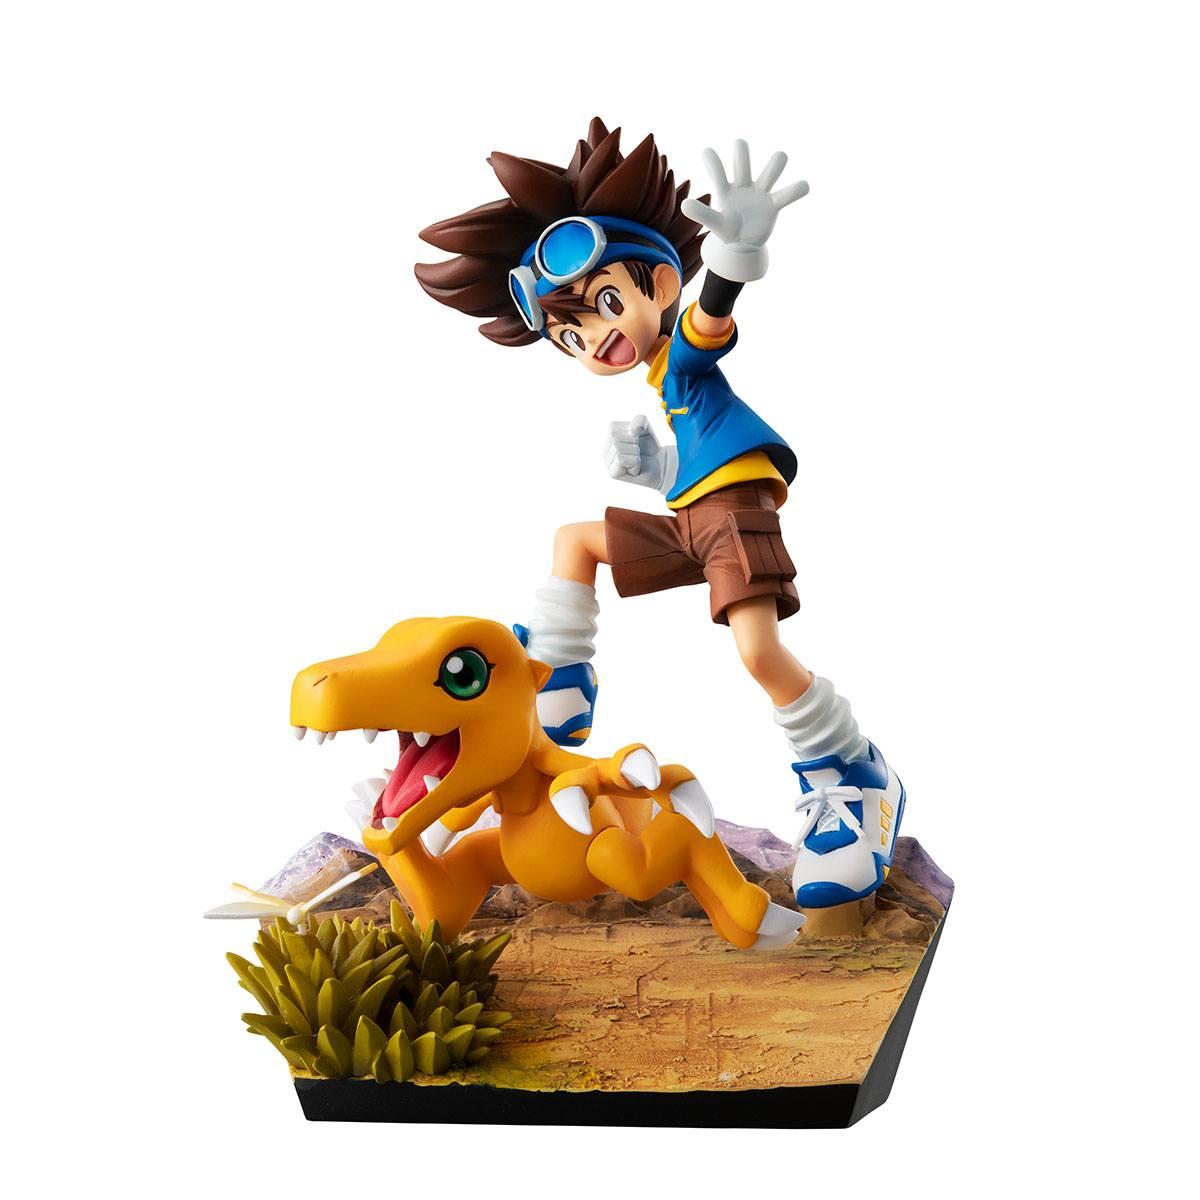 megahouse-digimon-adventure-gem-taichi-yagami-&-agumon-20th-anniversary-statue-toyslife-01